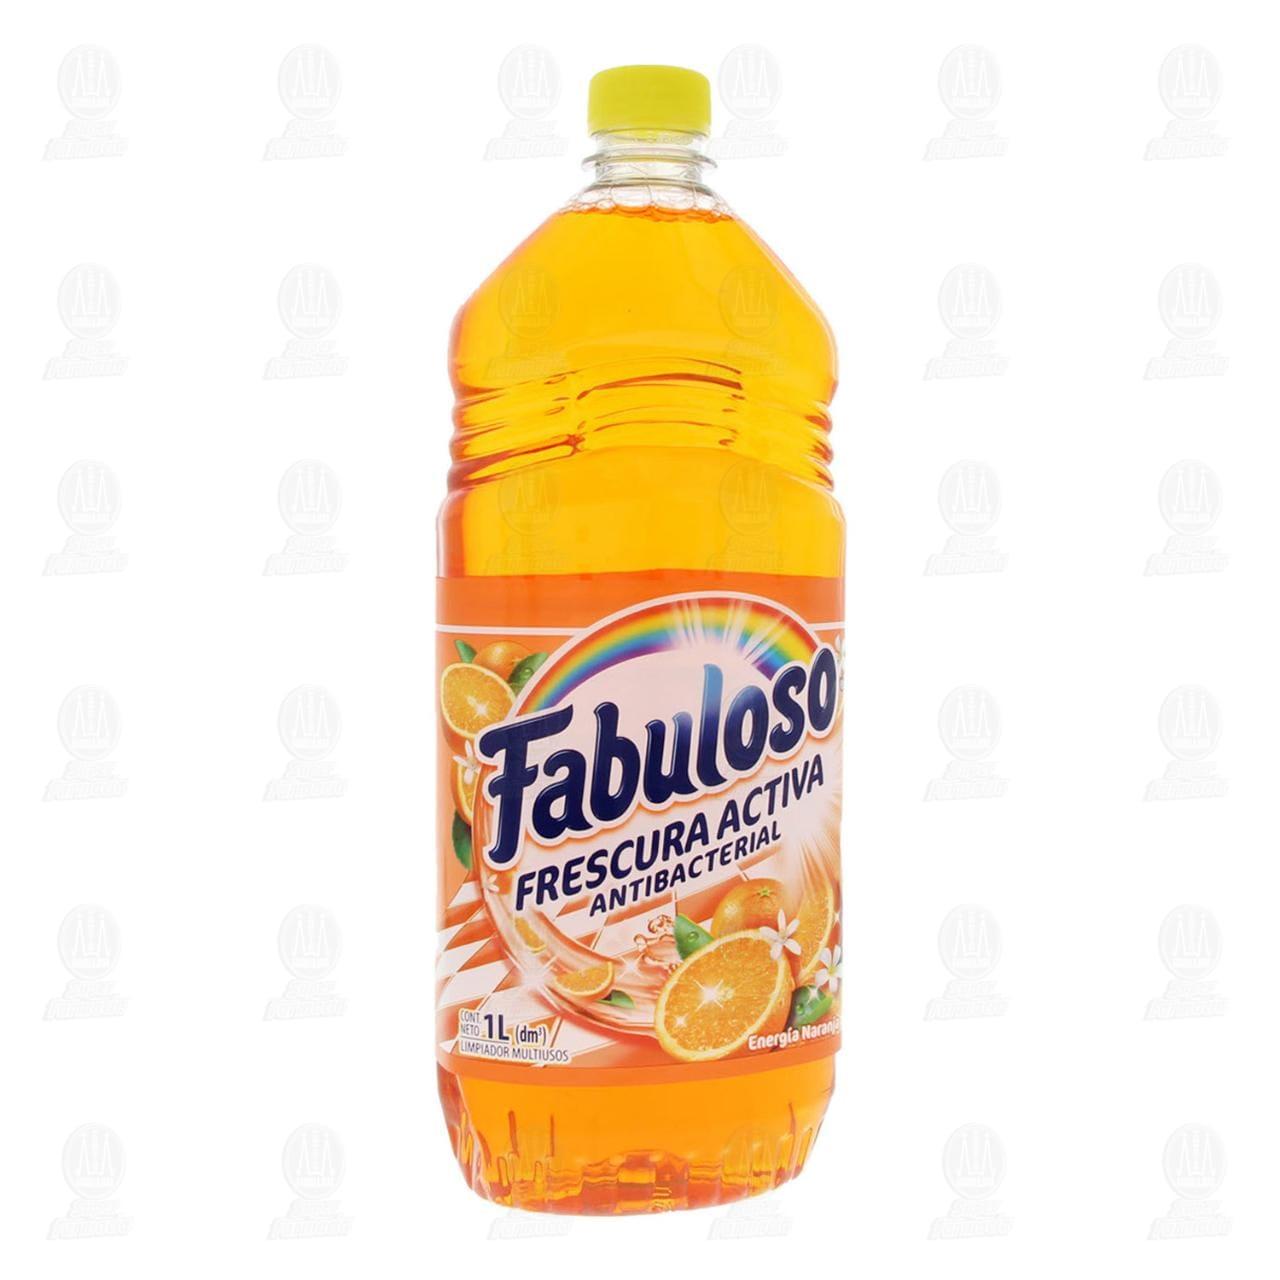 Limpiador Fabuloso Frescura Activa Naranja, 1 l.